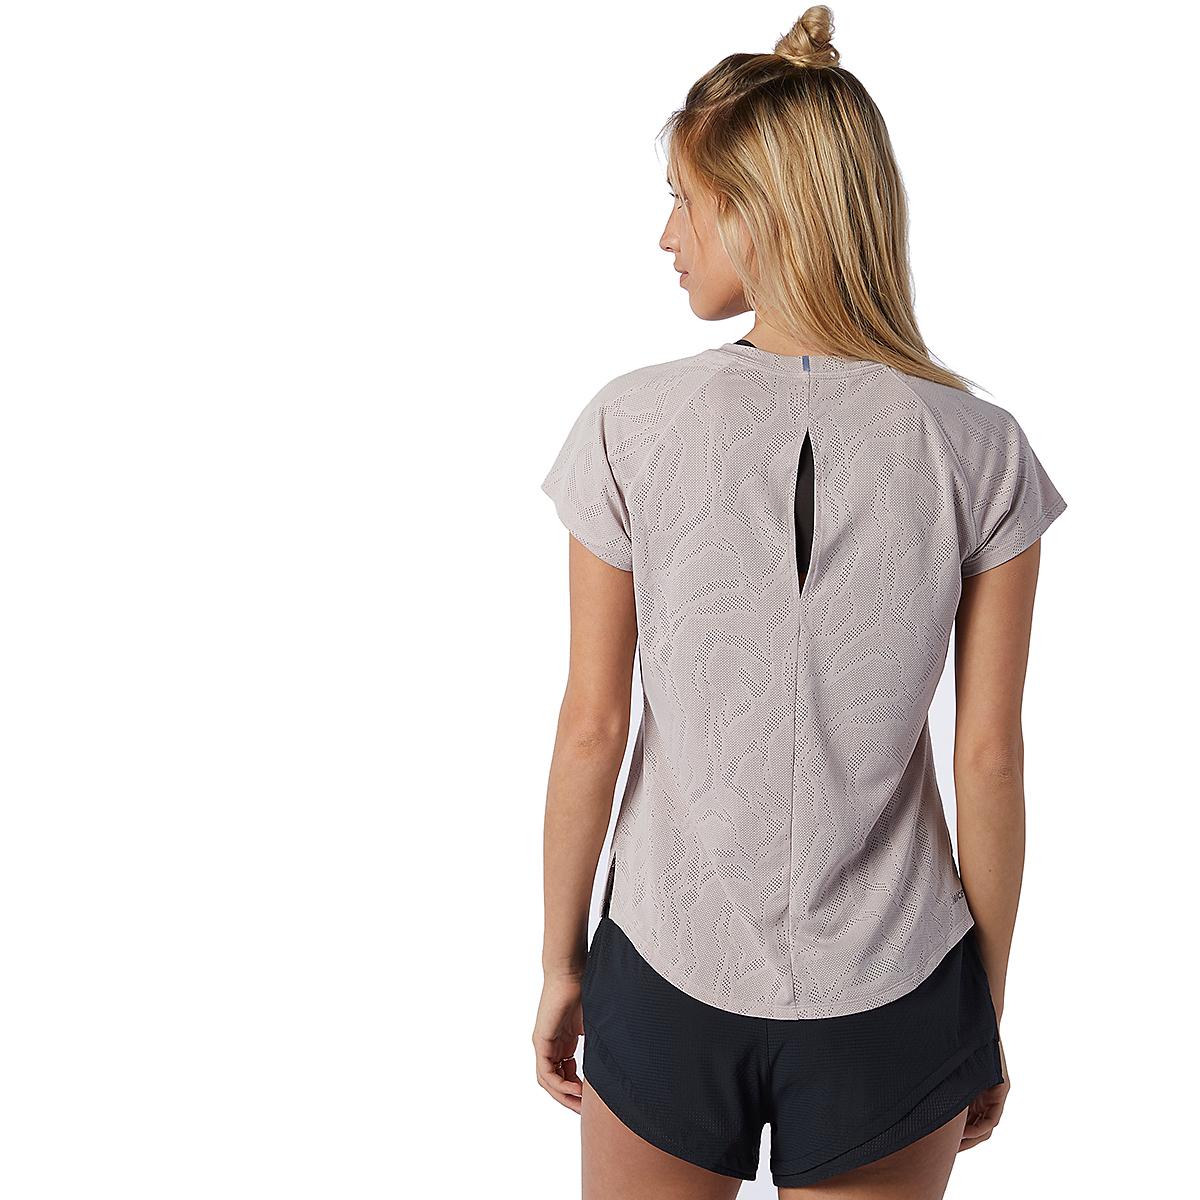 Women's New Balance Q Speed Fuel Jacquard Short Sleeve - Color: Logwood - Size: XS, Logwood, large, image 2